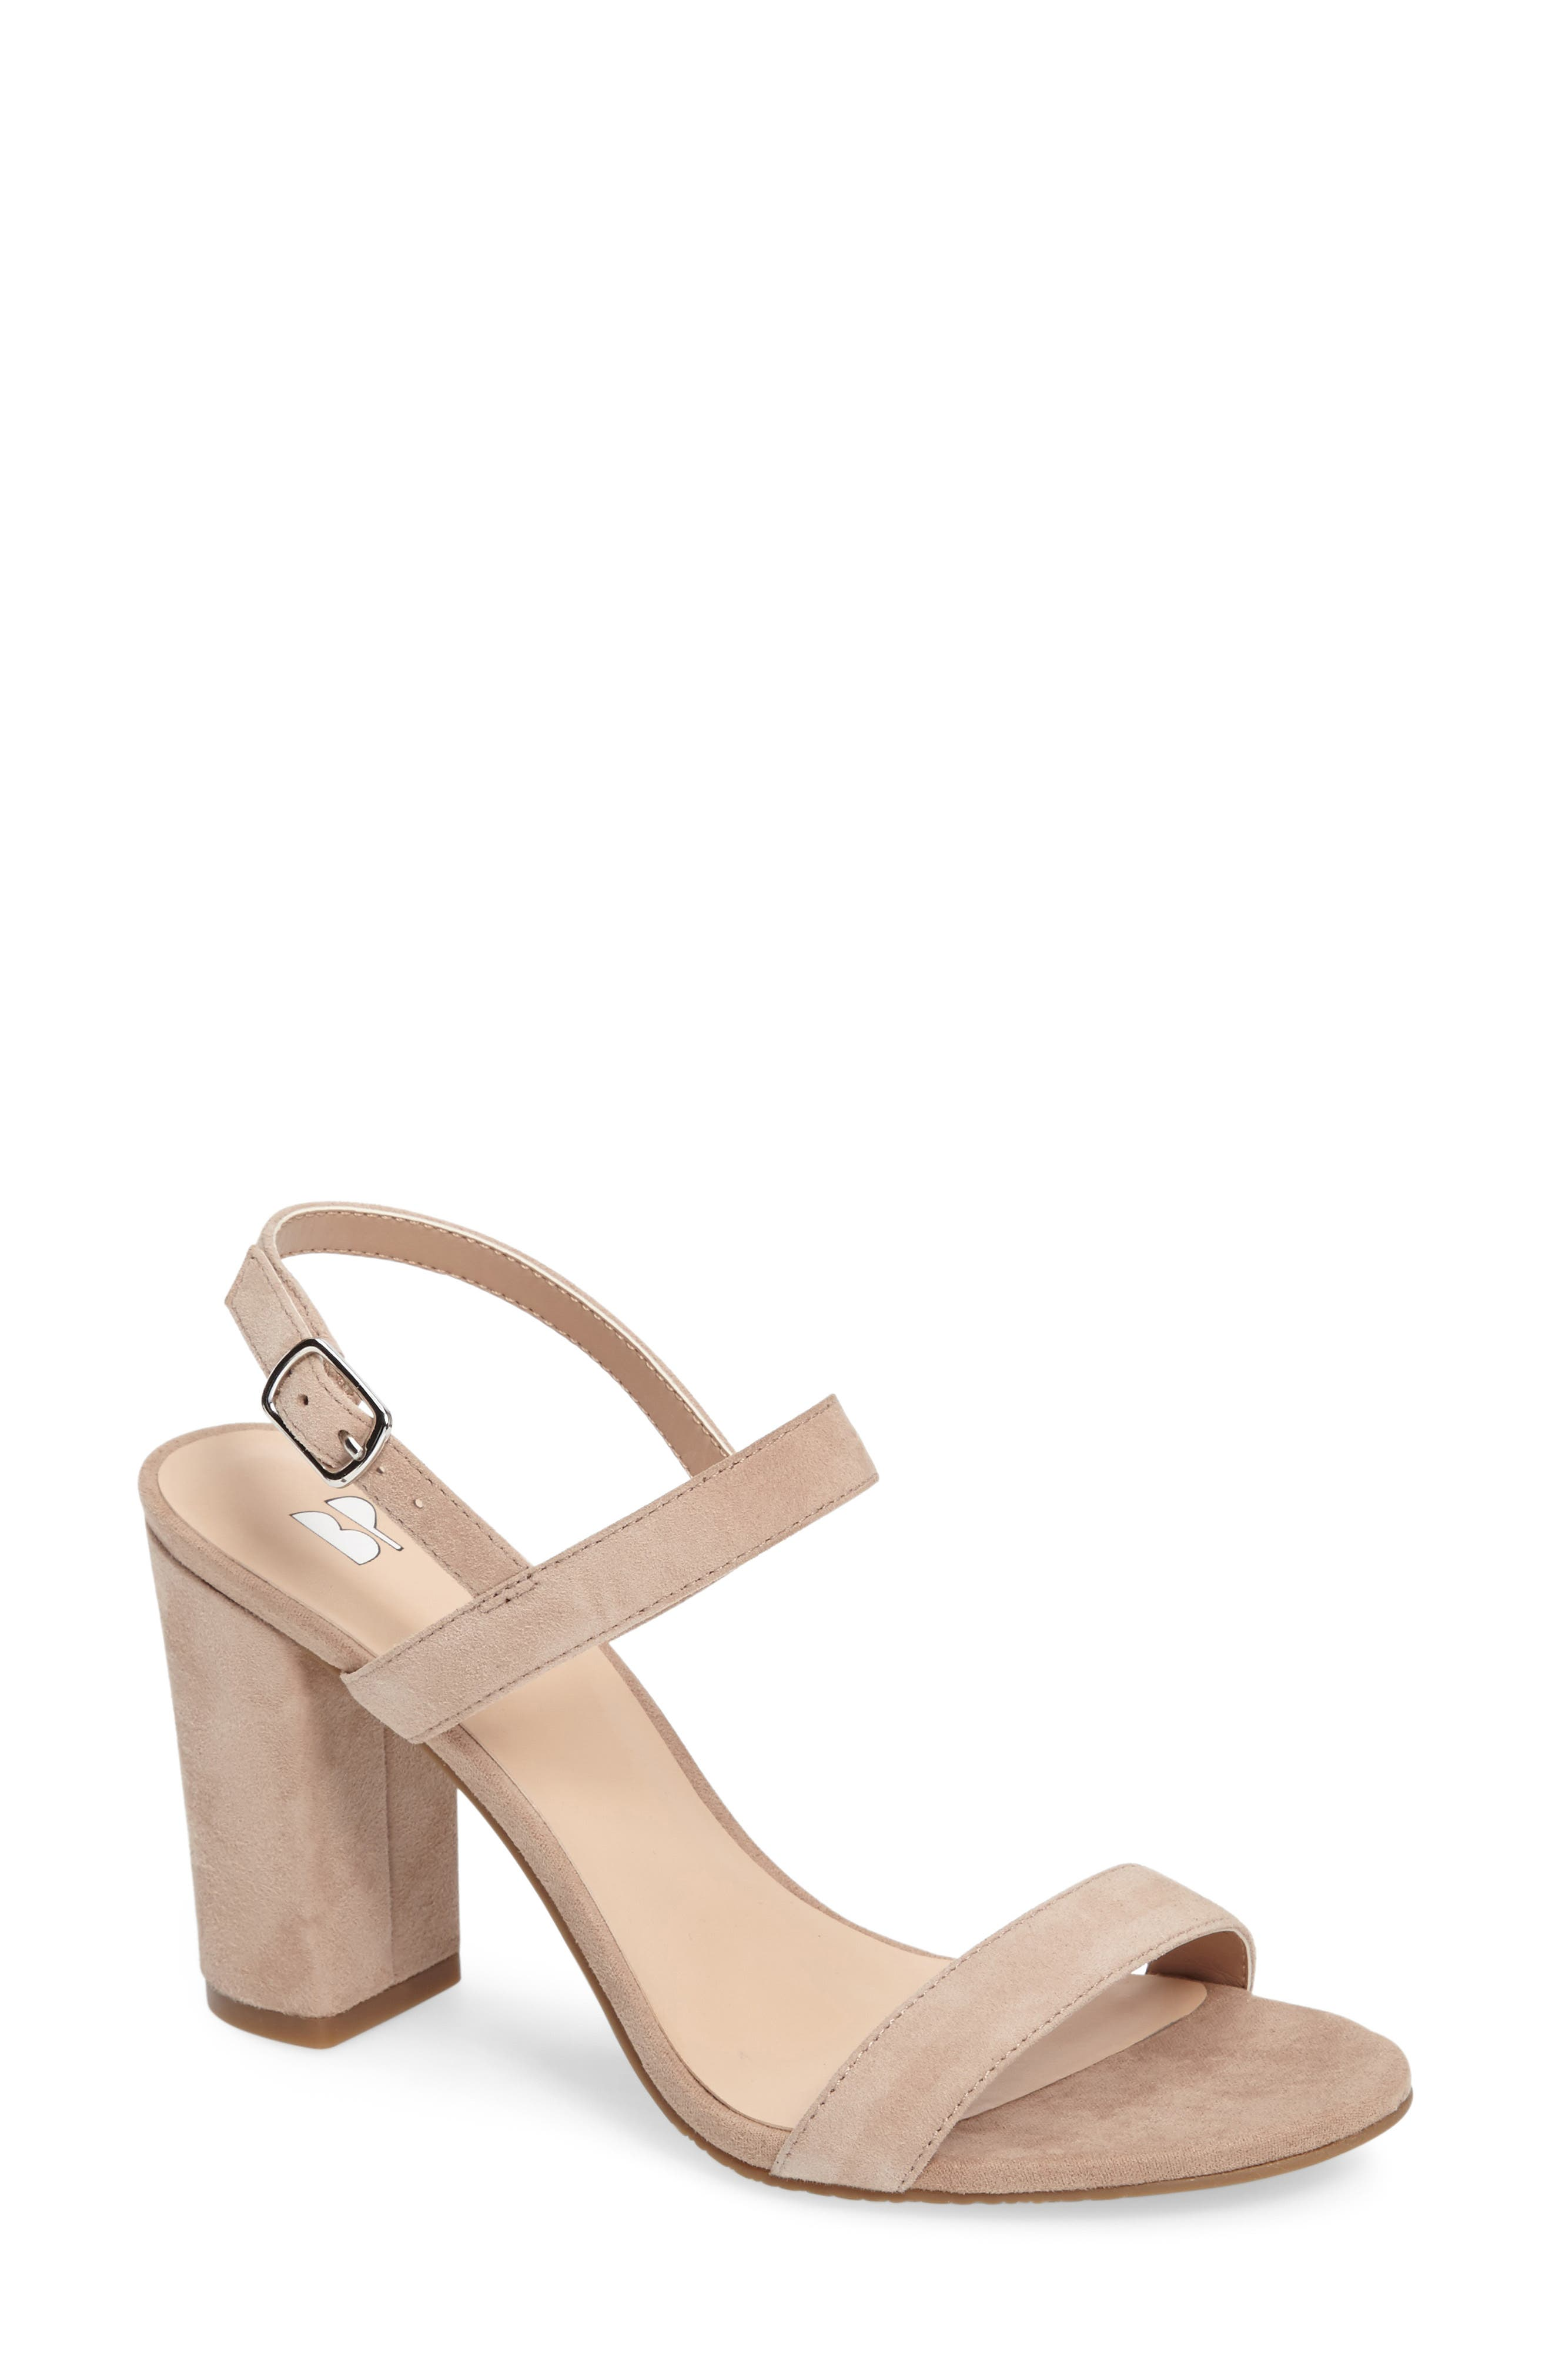 BP. Lula Block Heel Slingback Sandal, Main, color, BLUSH SUEDE